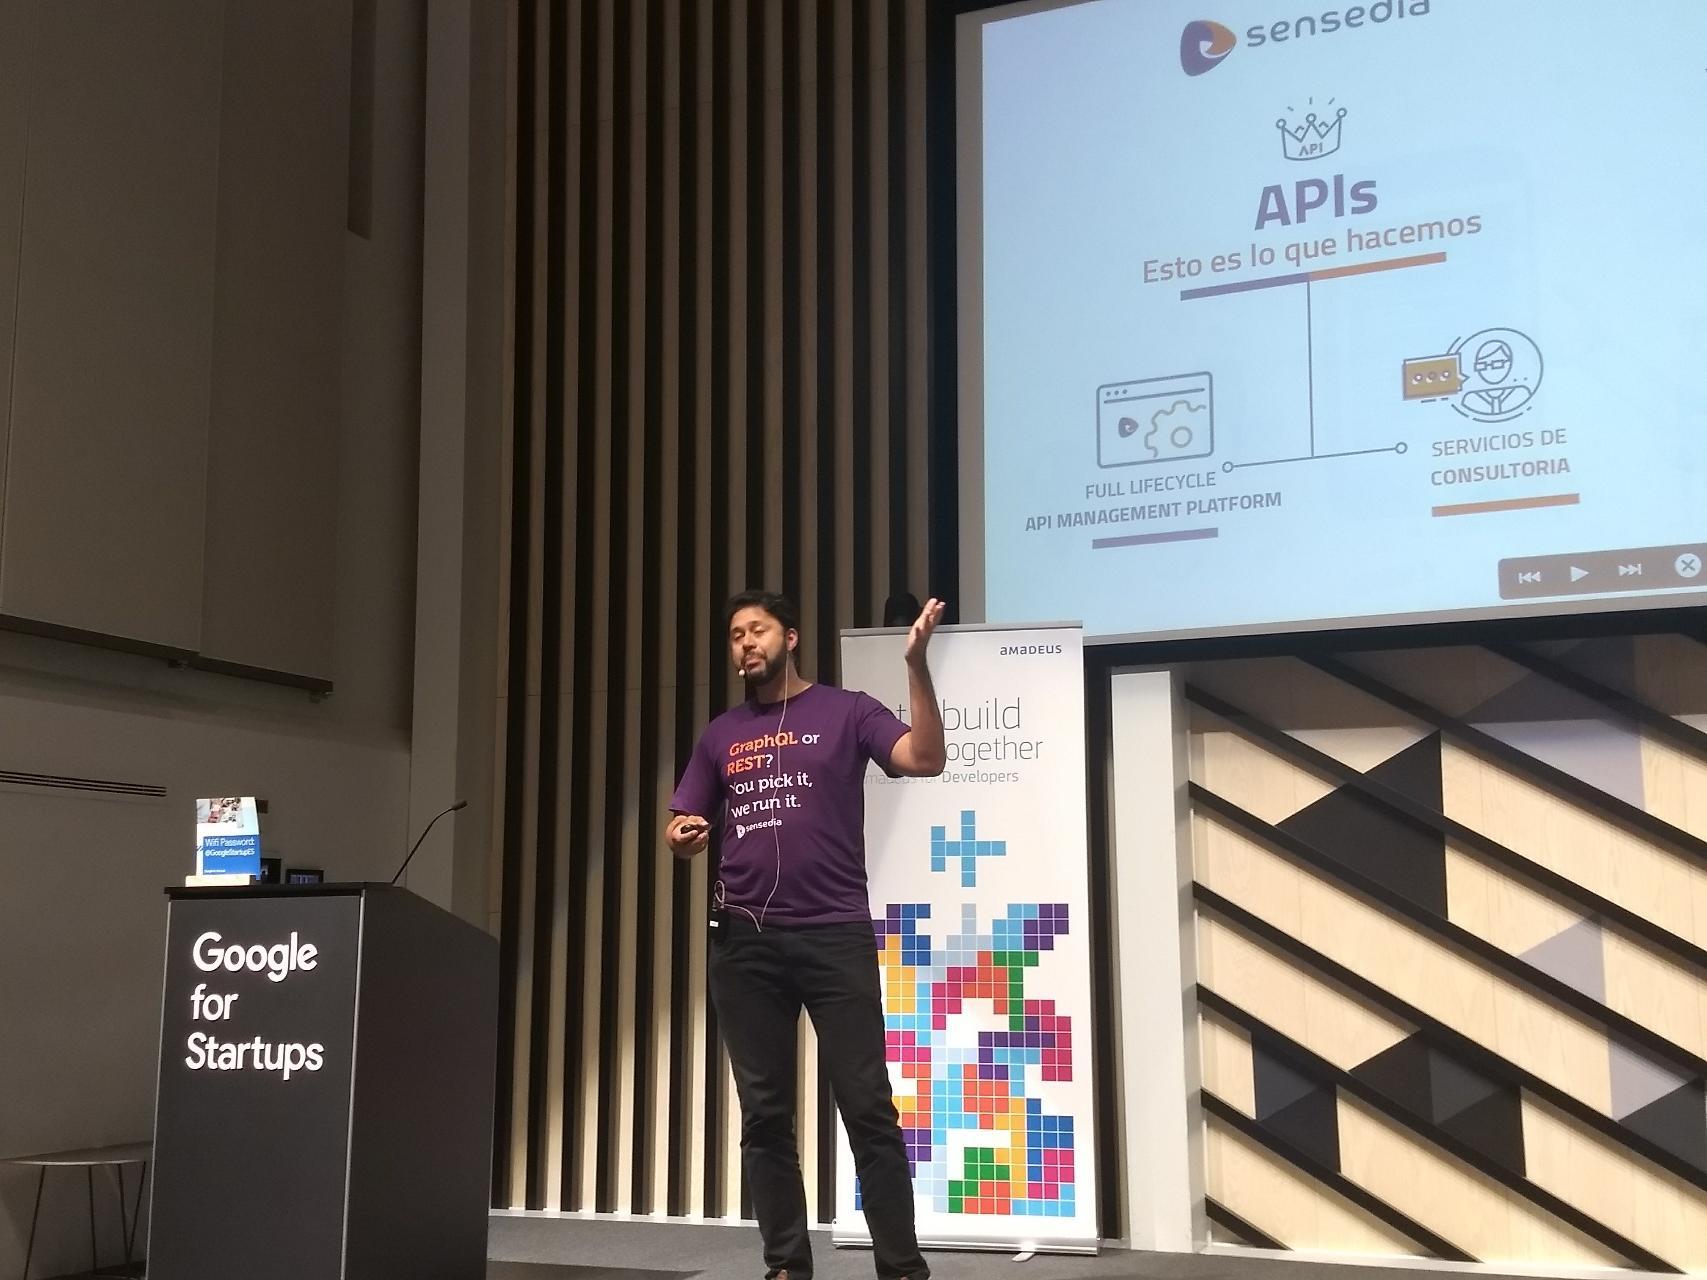 Rafael Rocha - Sensedia - APIDays Madrid 2019